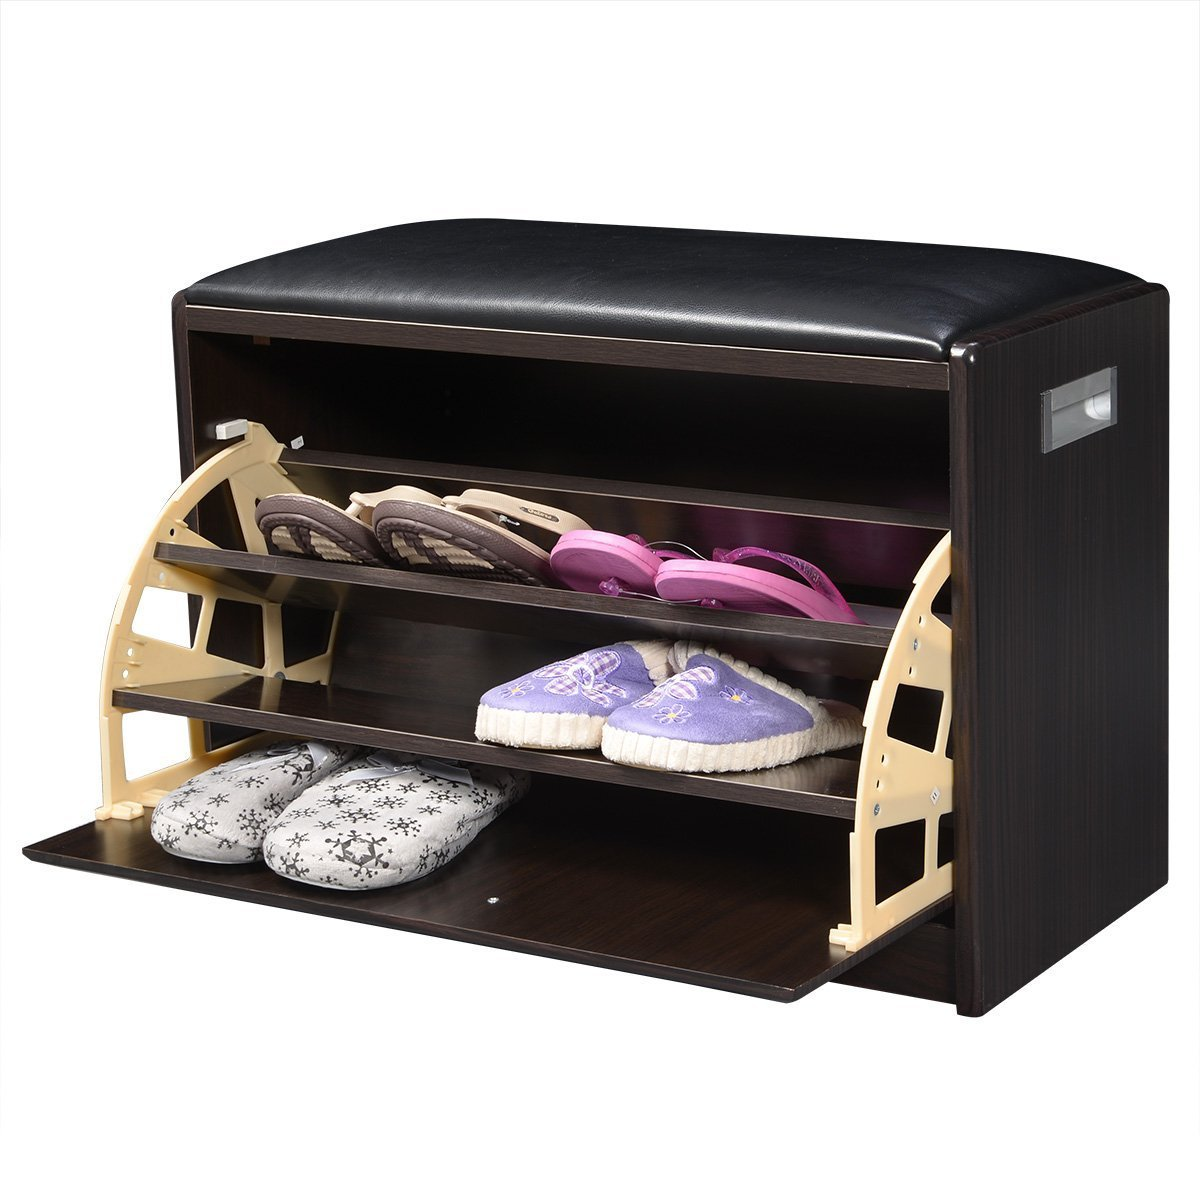 Giantex Wood Shoe Storage Cabinet Bench Ottoman Closet Shelf Entryway Pu Leather Seat